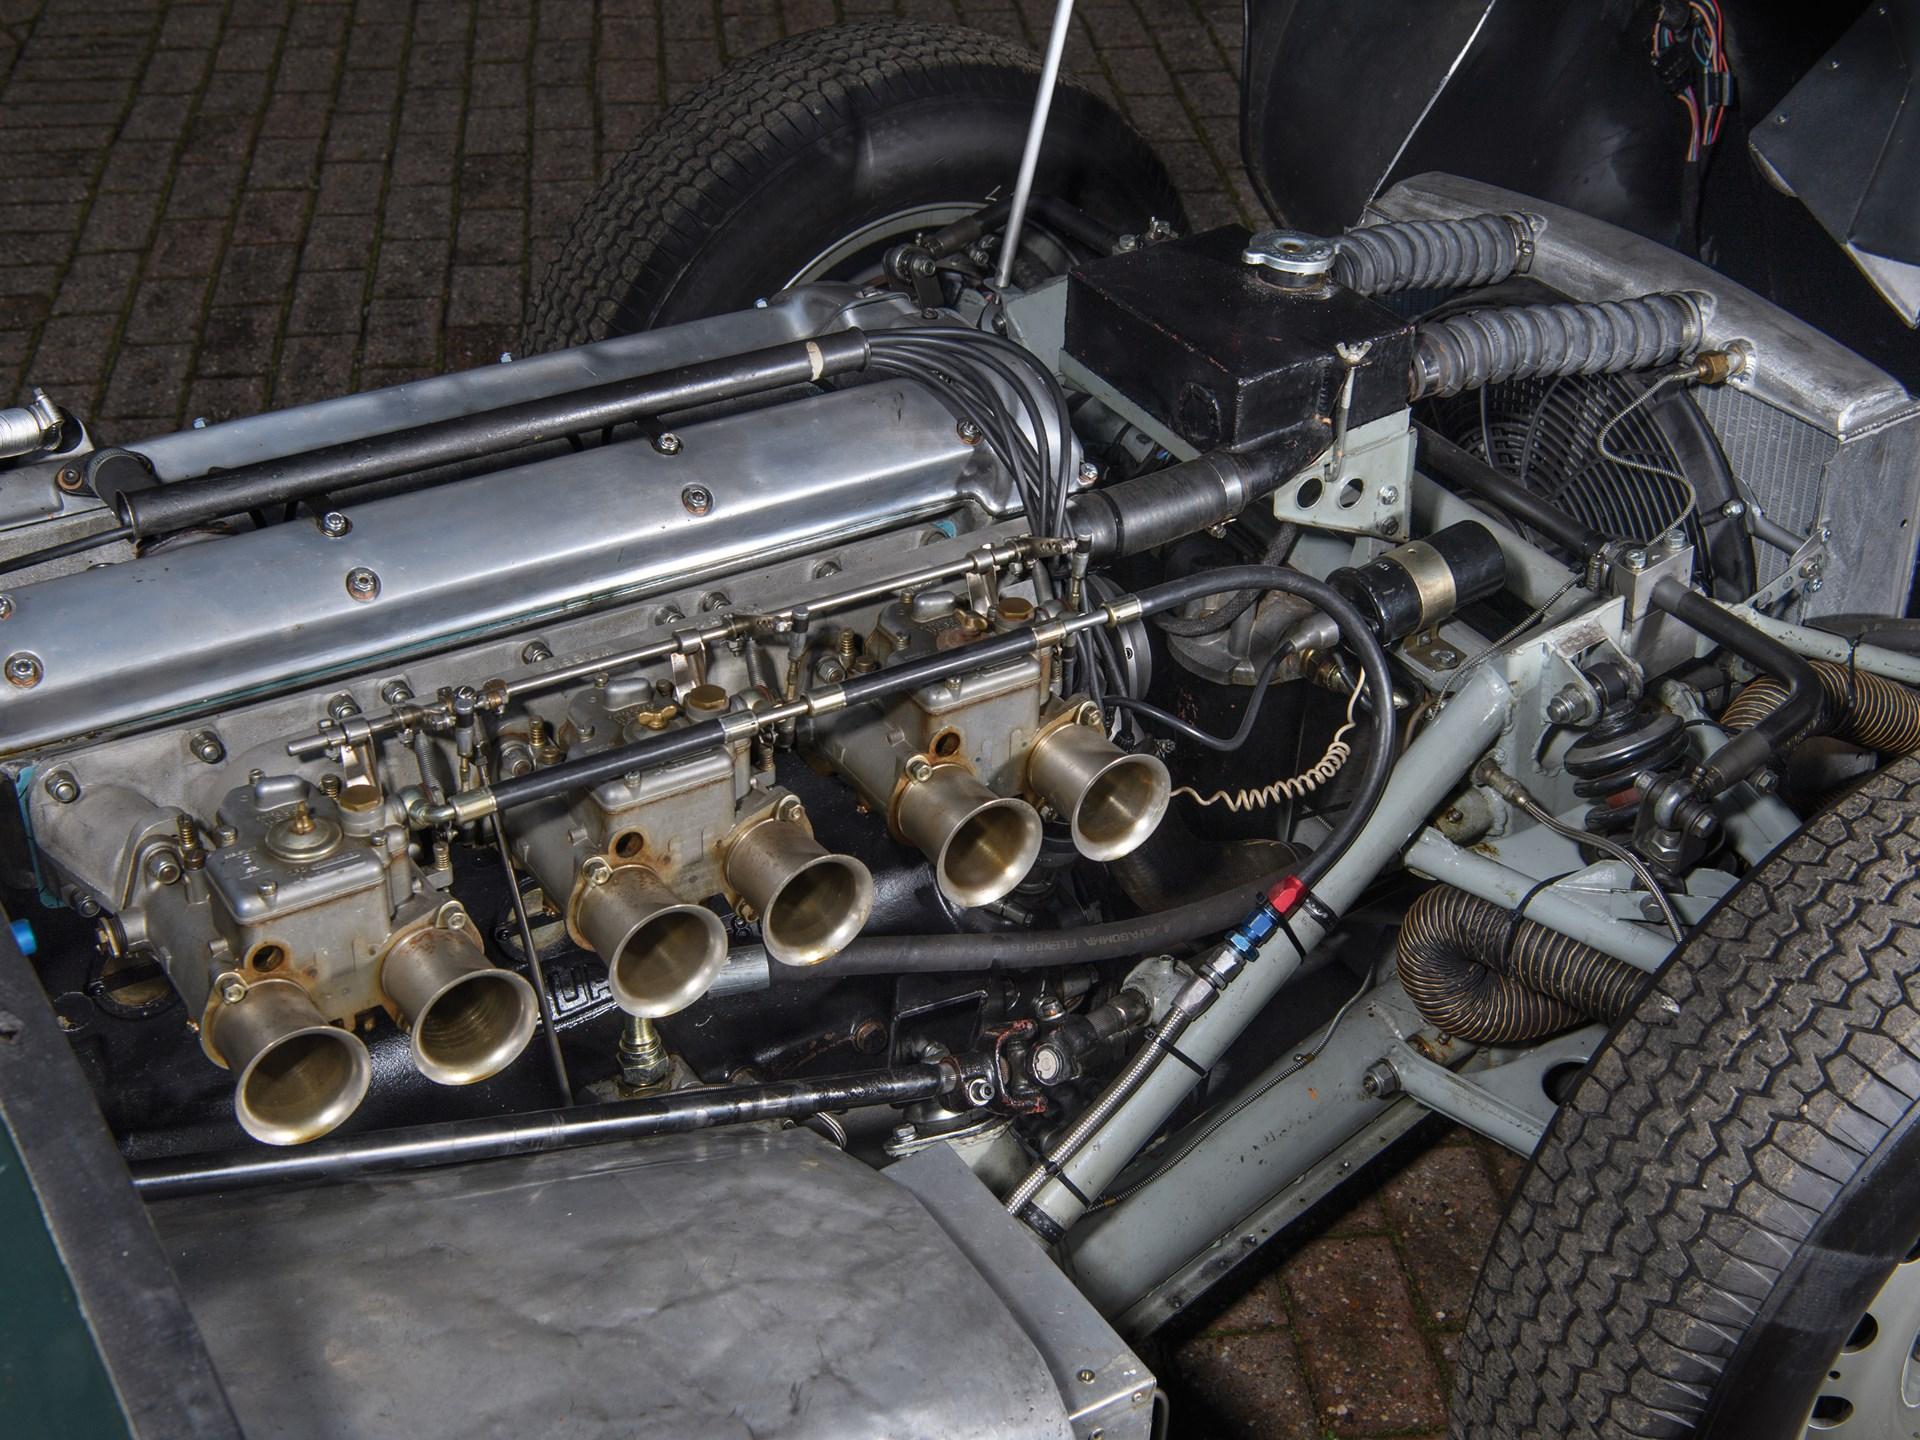 1959 Lister-Jaguar Costin